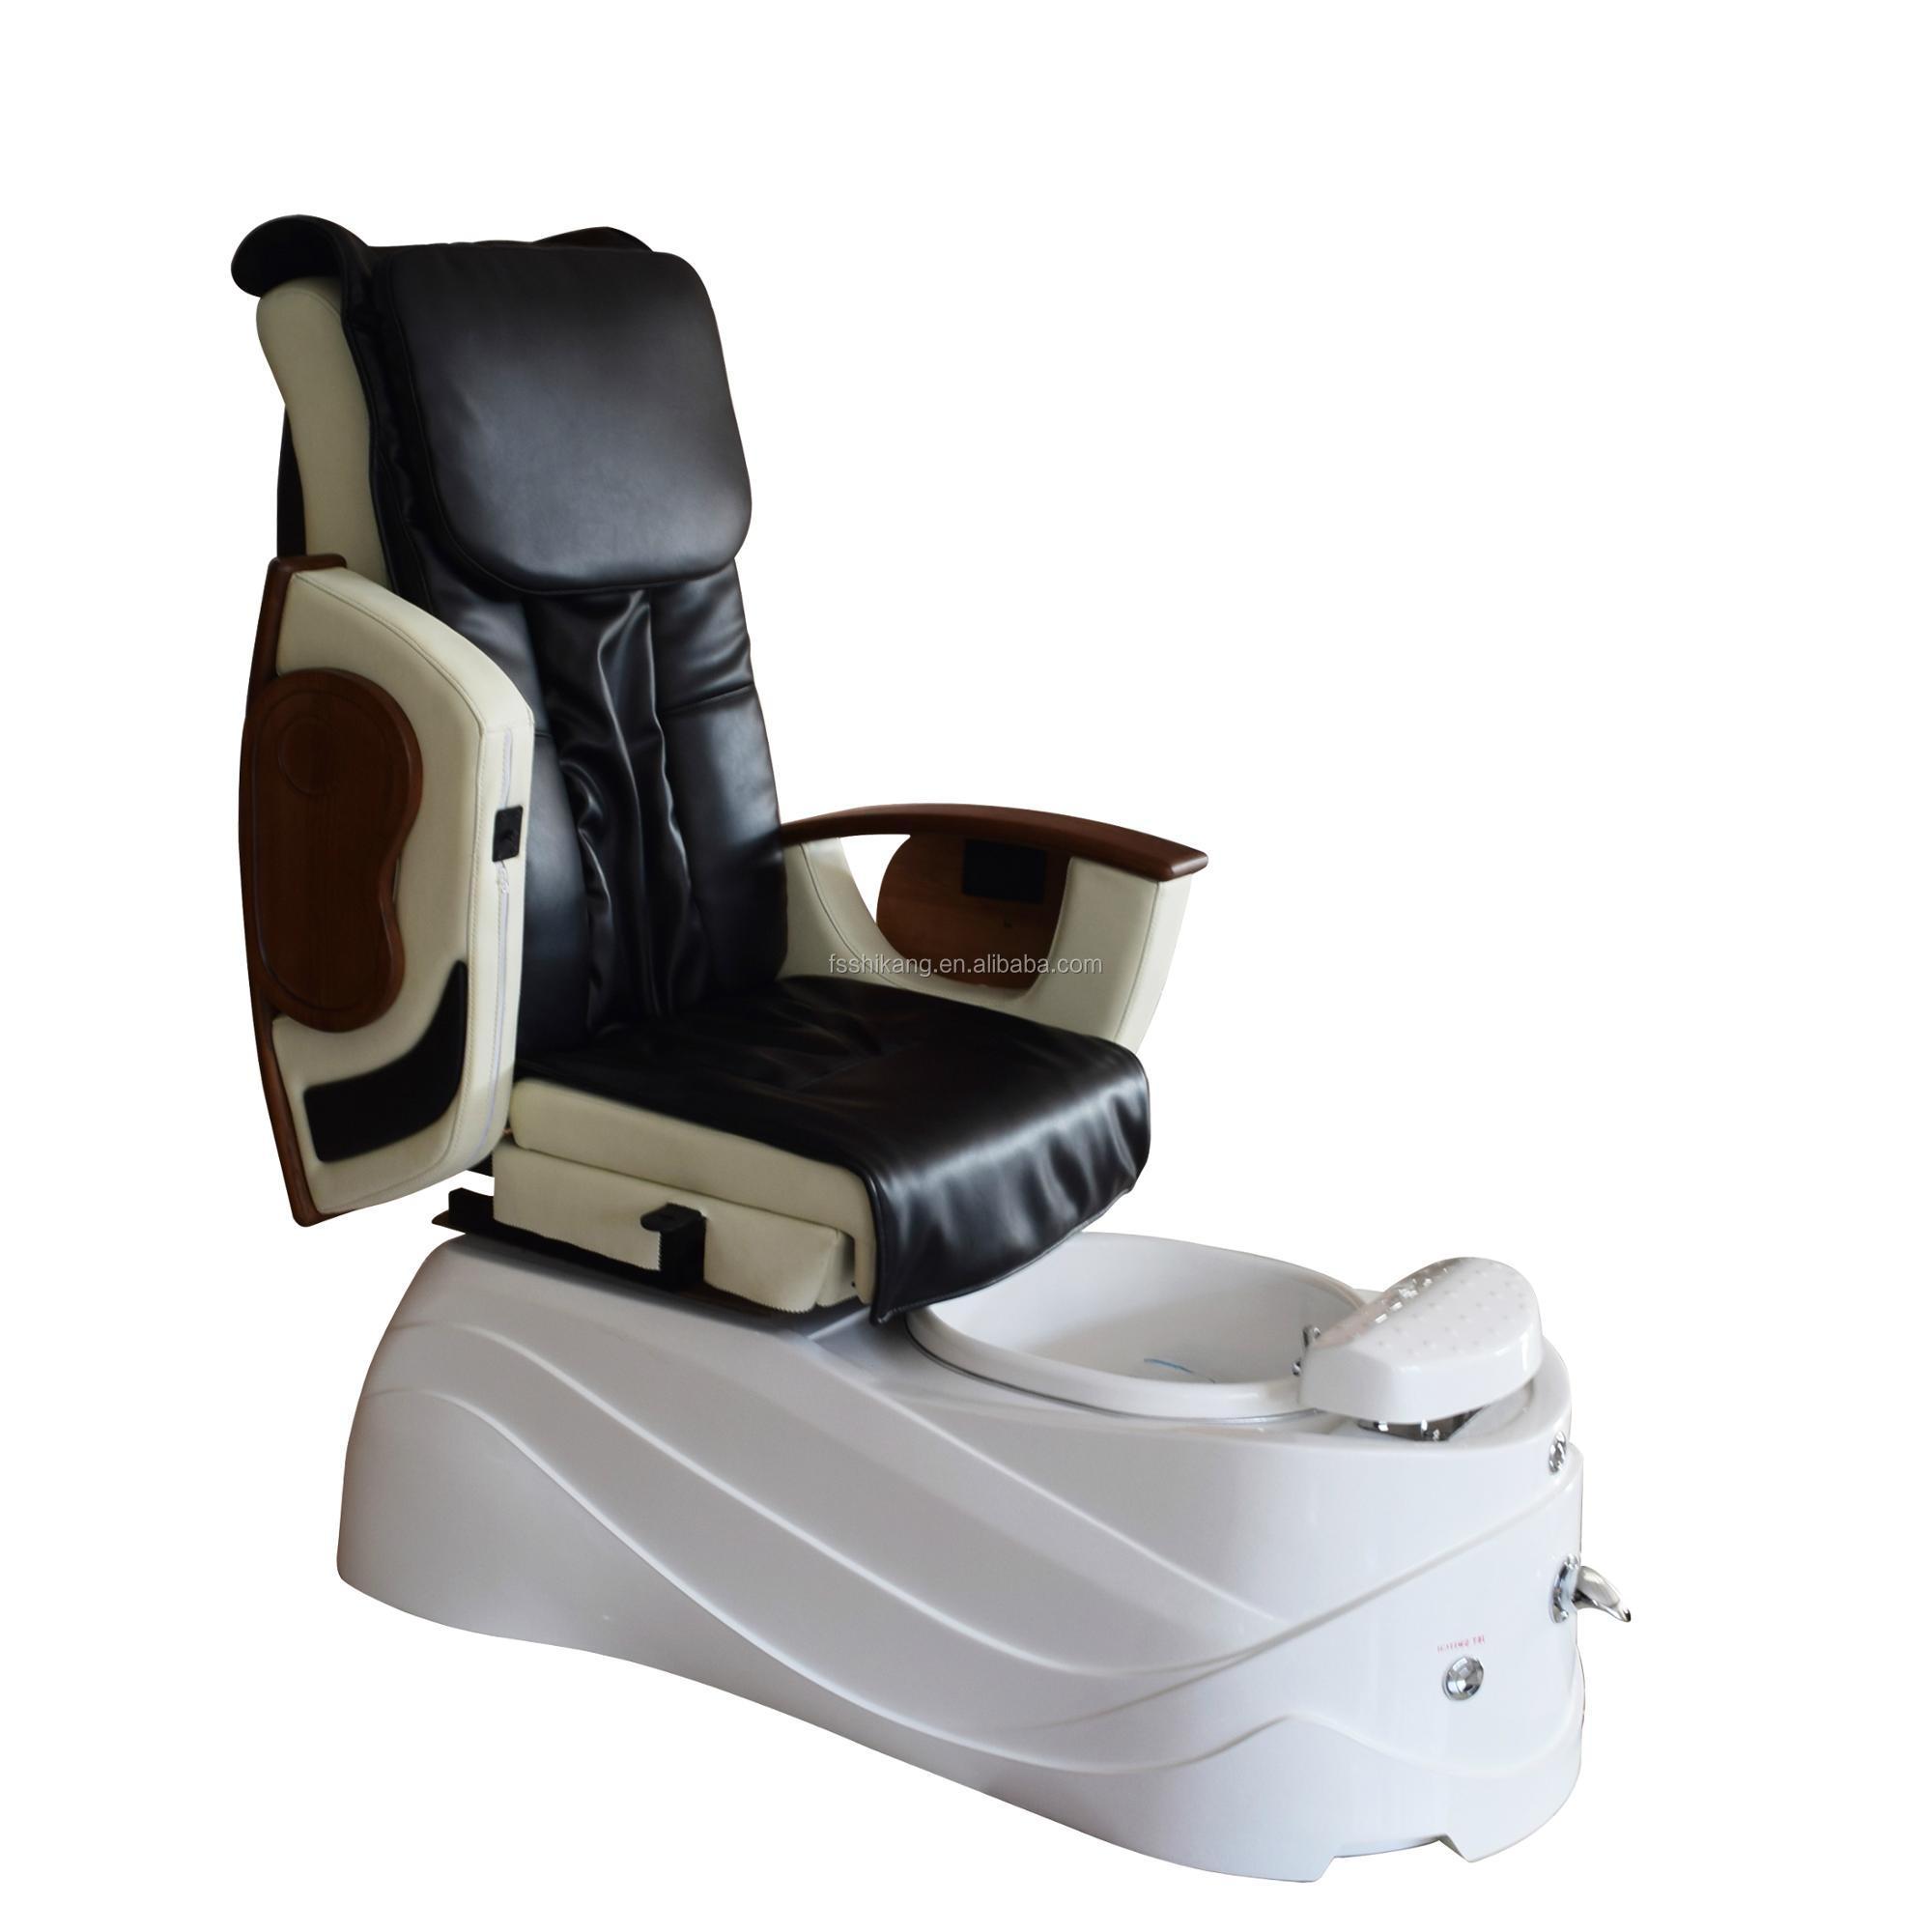 Manicure And Pedicure Chair Manicure And Pedicure Chair Suppliers